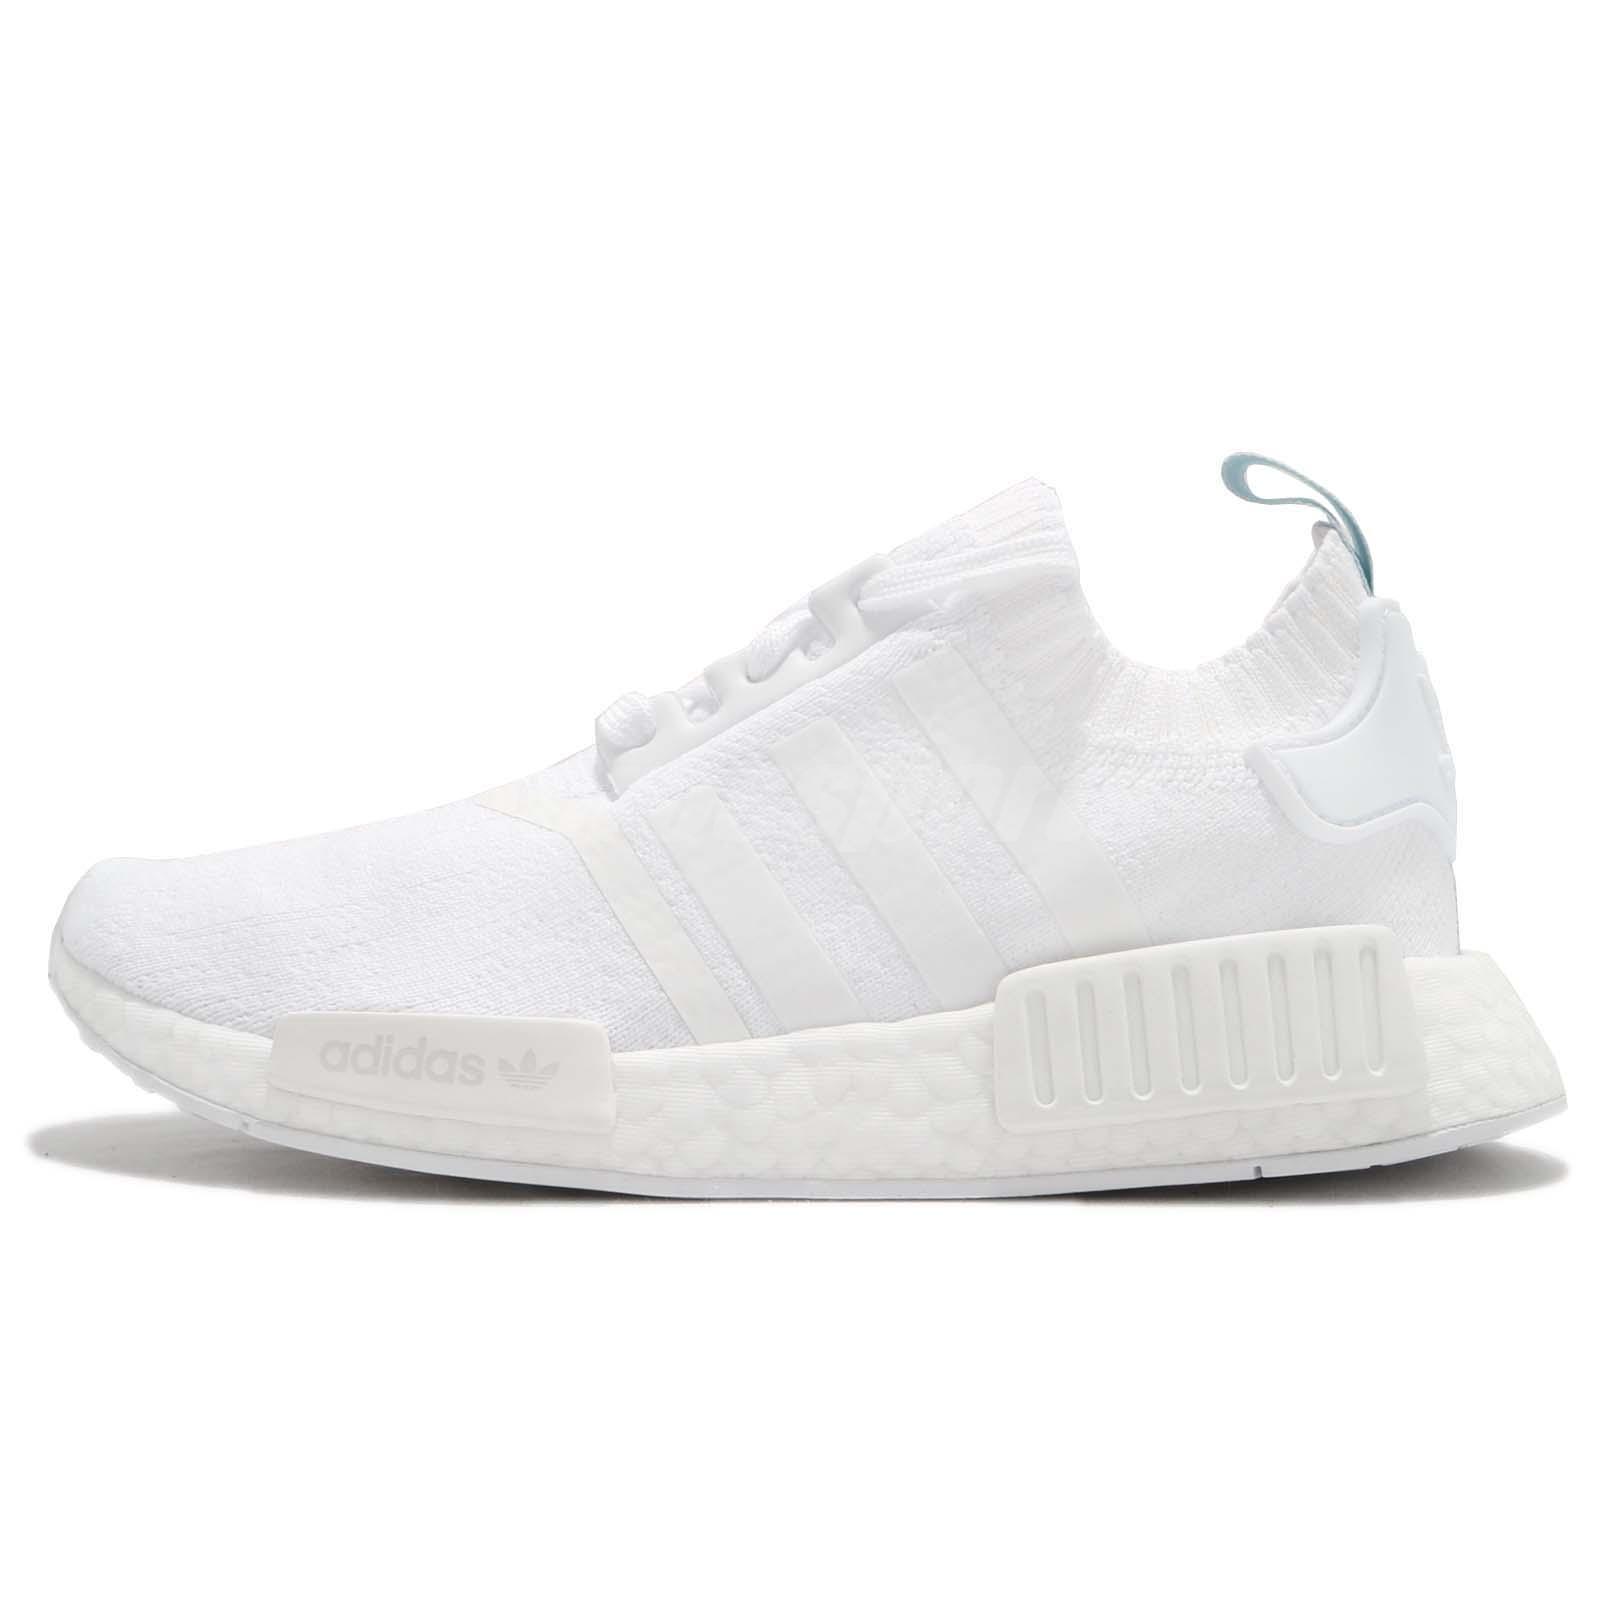 adidas Originals NMD_R1 PK W Primeknit White Blue Tint Women Running Shoe  CQ2040